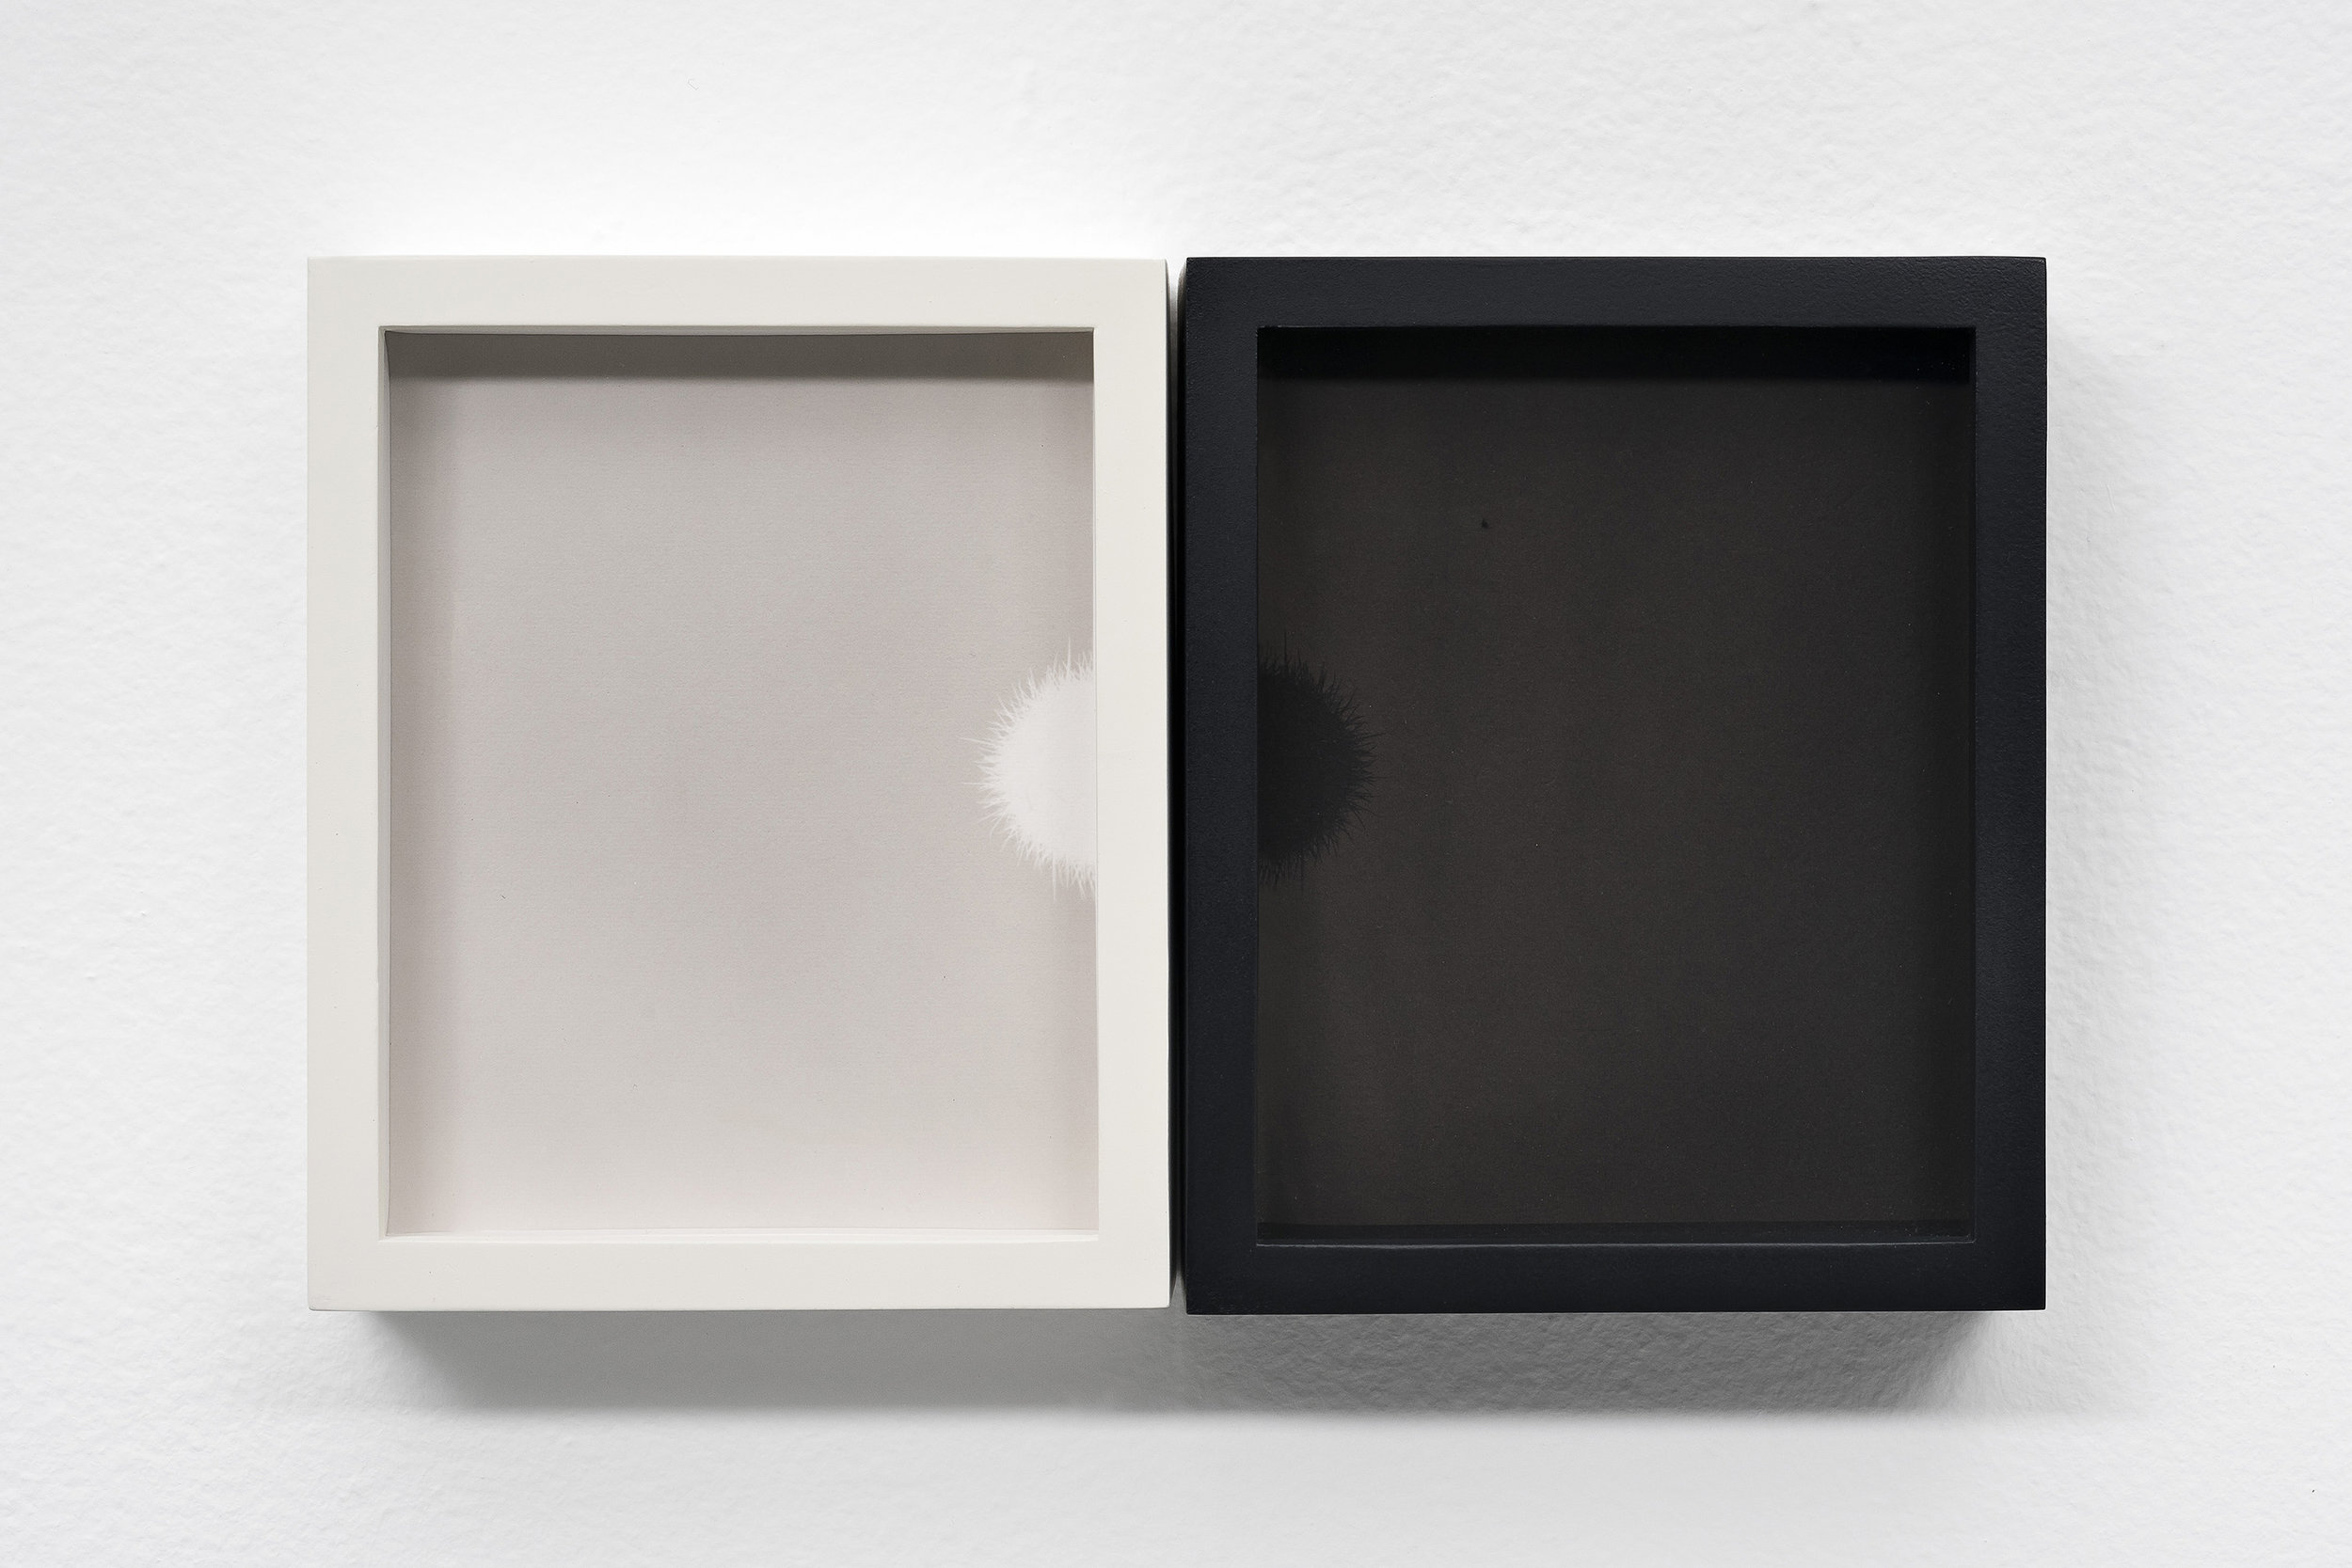 SCOTT B. DAVIS Sphere 1 (Sonoran Desert), 2018 Unique paper negative palladium / platinum prints, diptych 5 x 8 inches